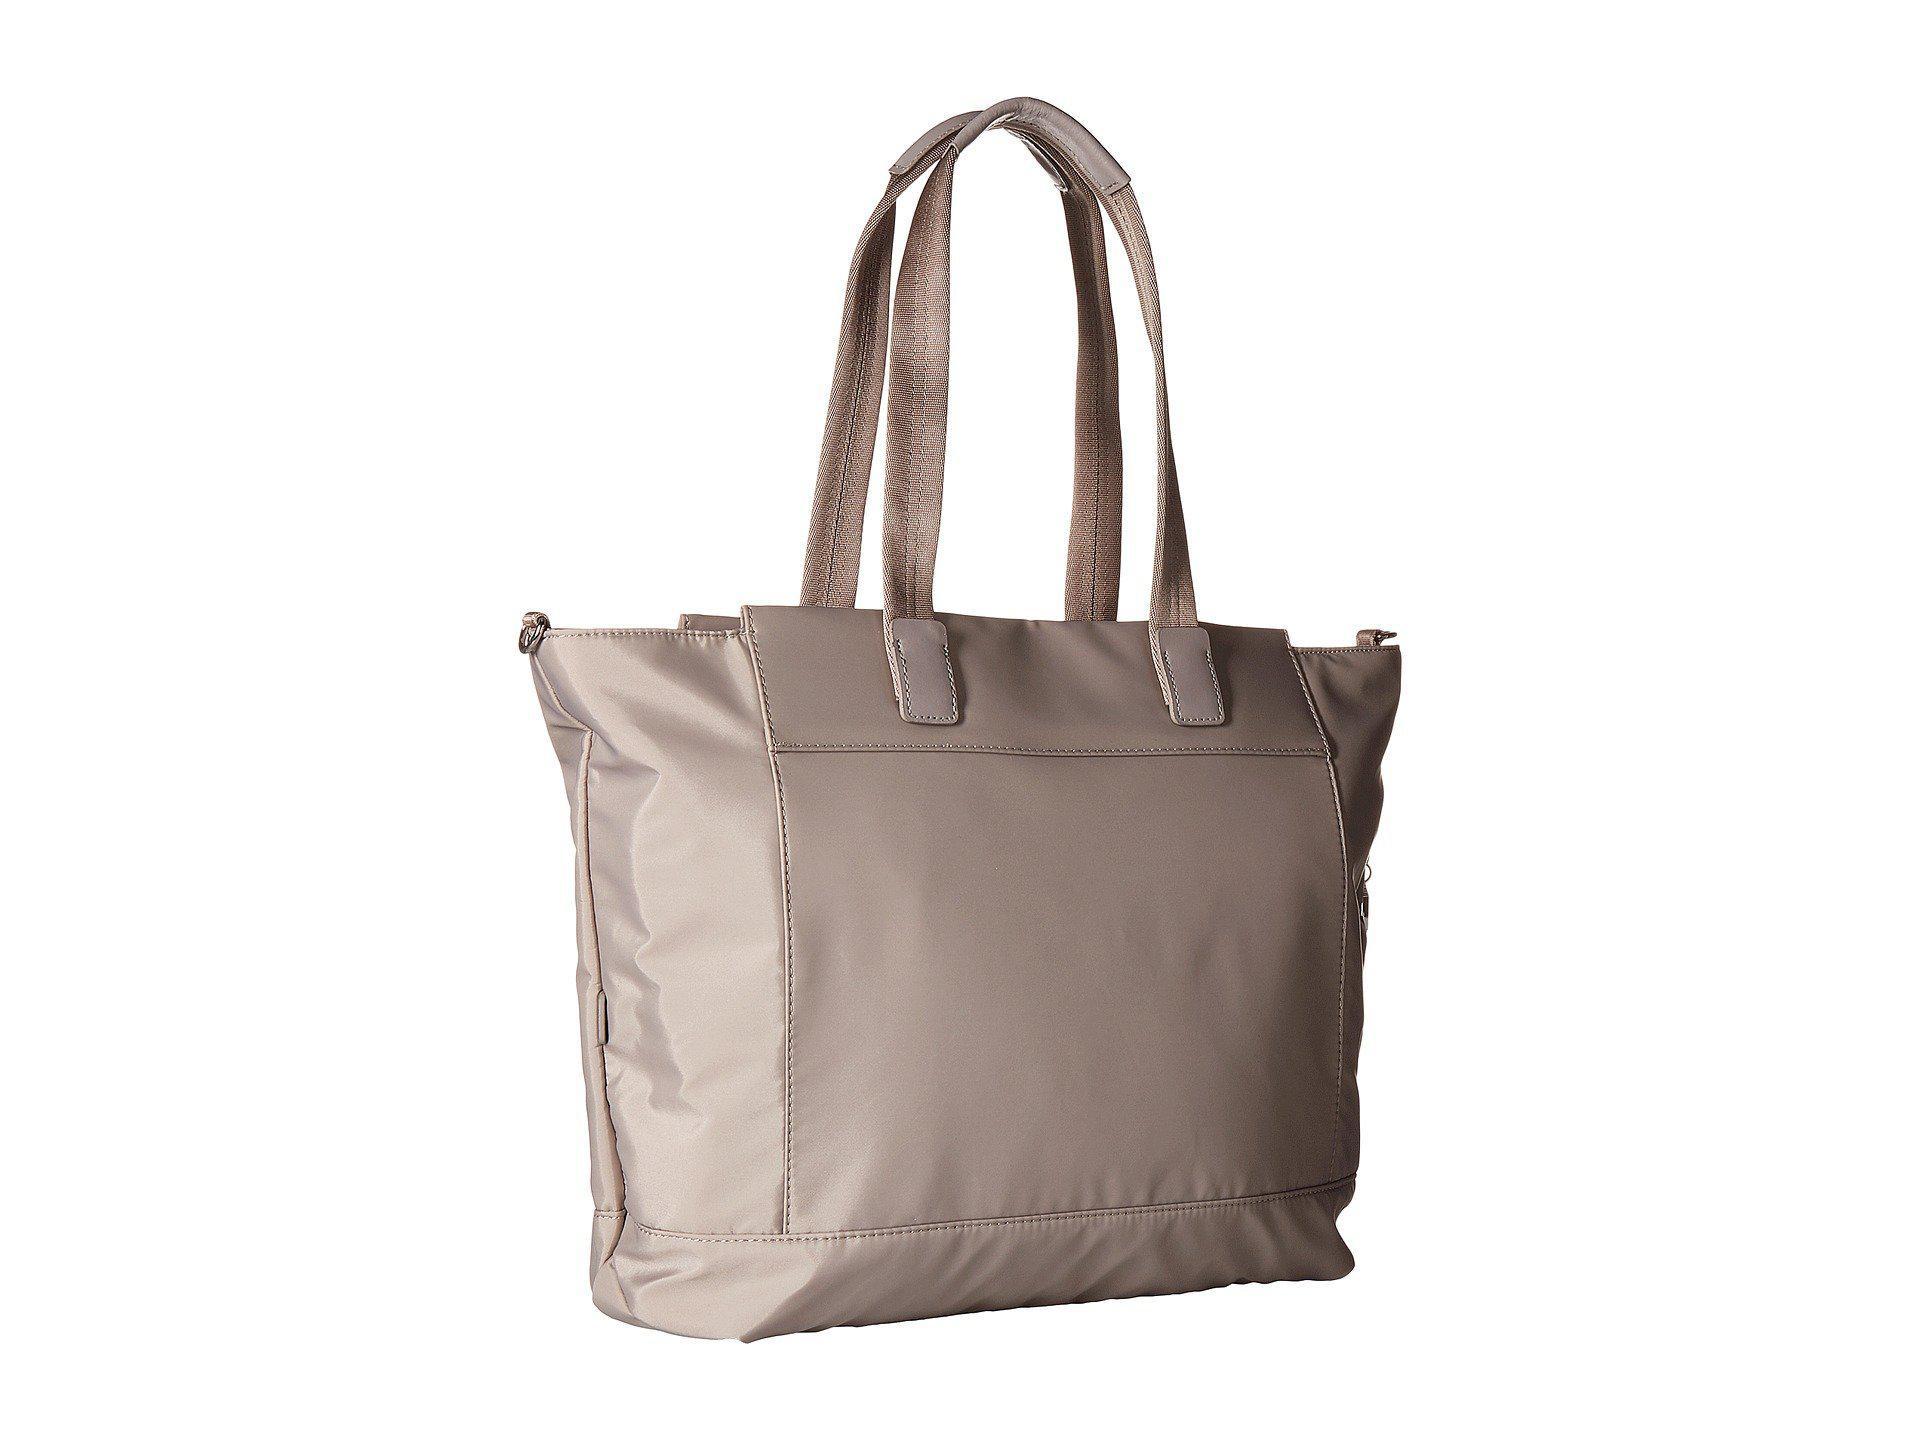 ef3bd980febf Hedgren - Multicolor Glaze Rfid Large Tote (zinc) Tote Handbags - Lyst.  View fullscreen